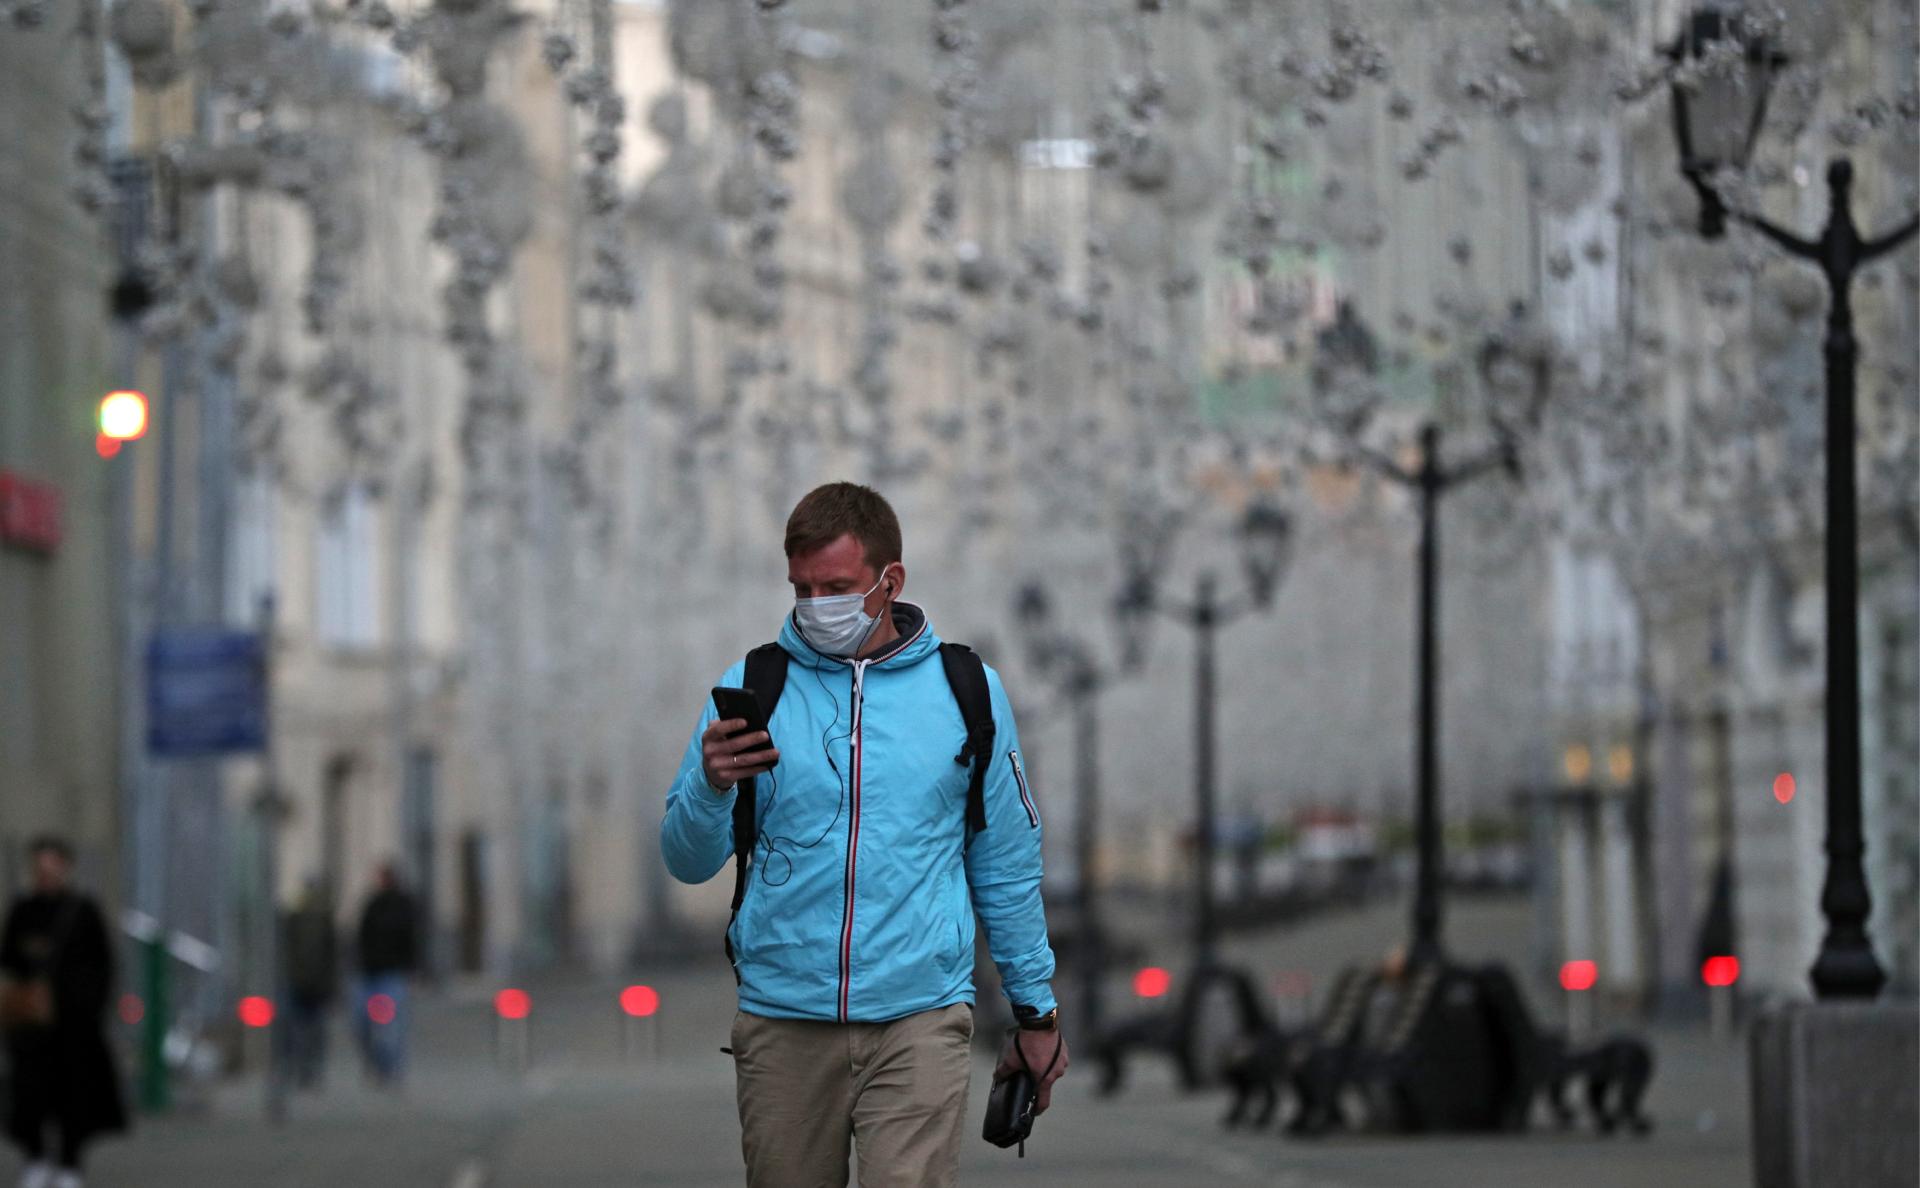 Фото:Терещенко Михаил / РИА Новости